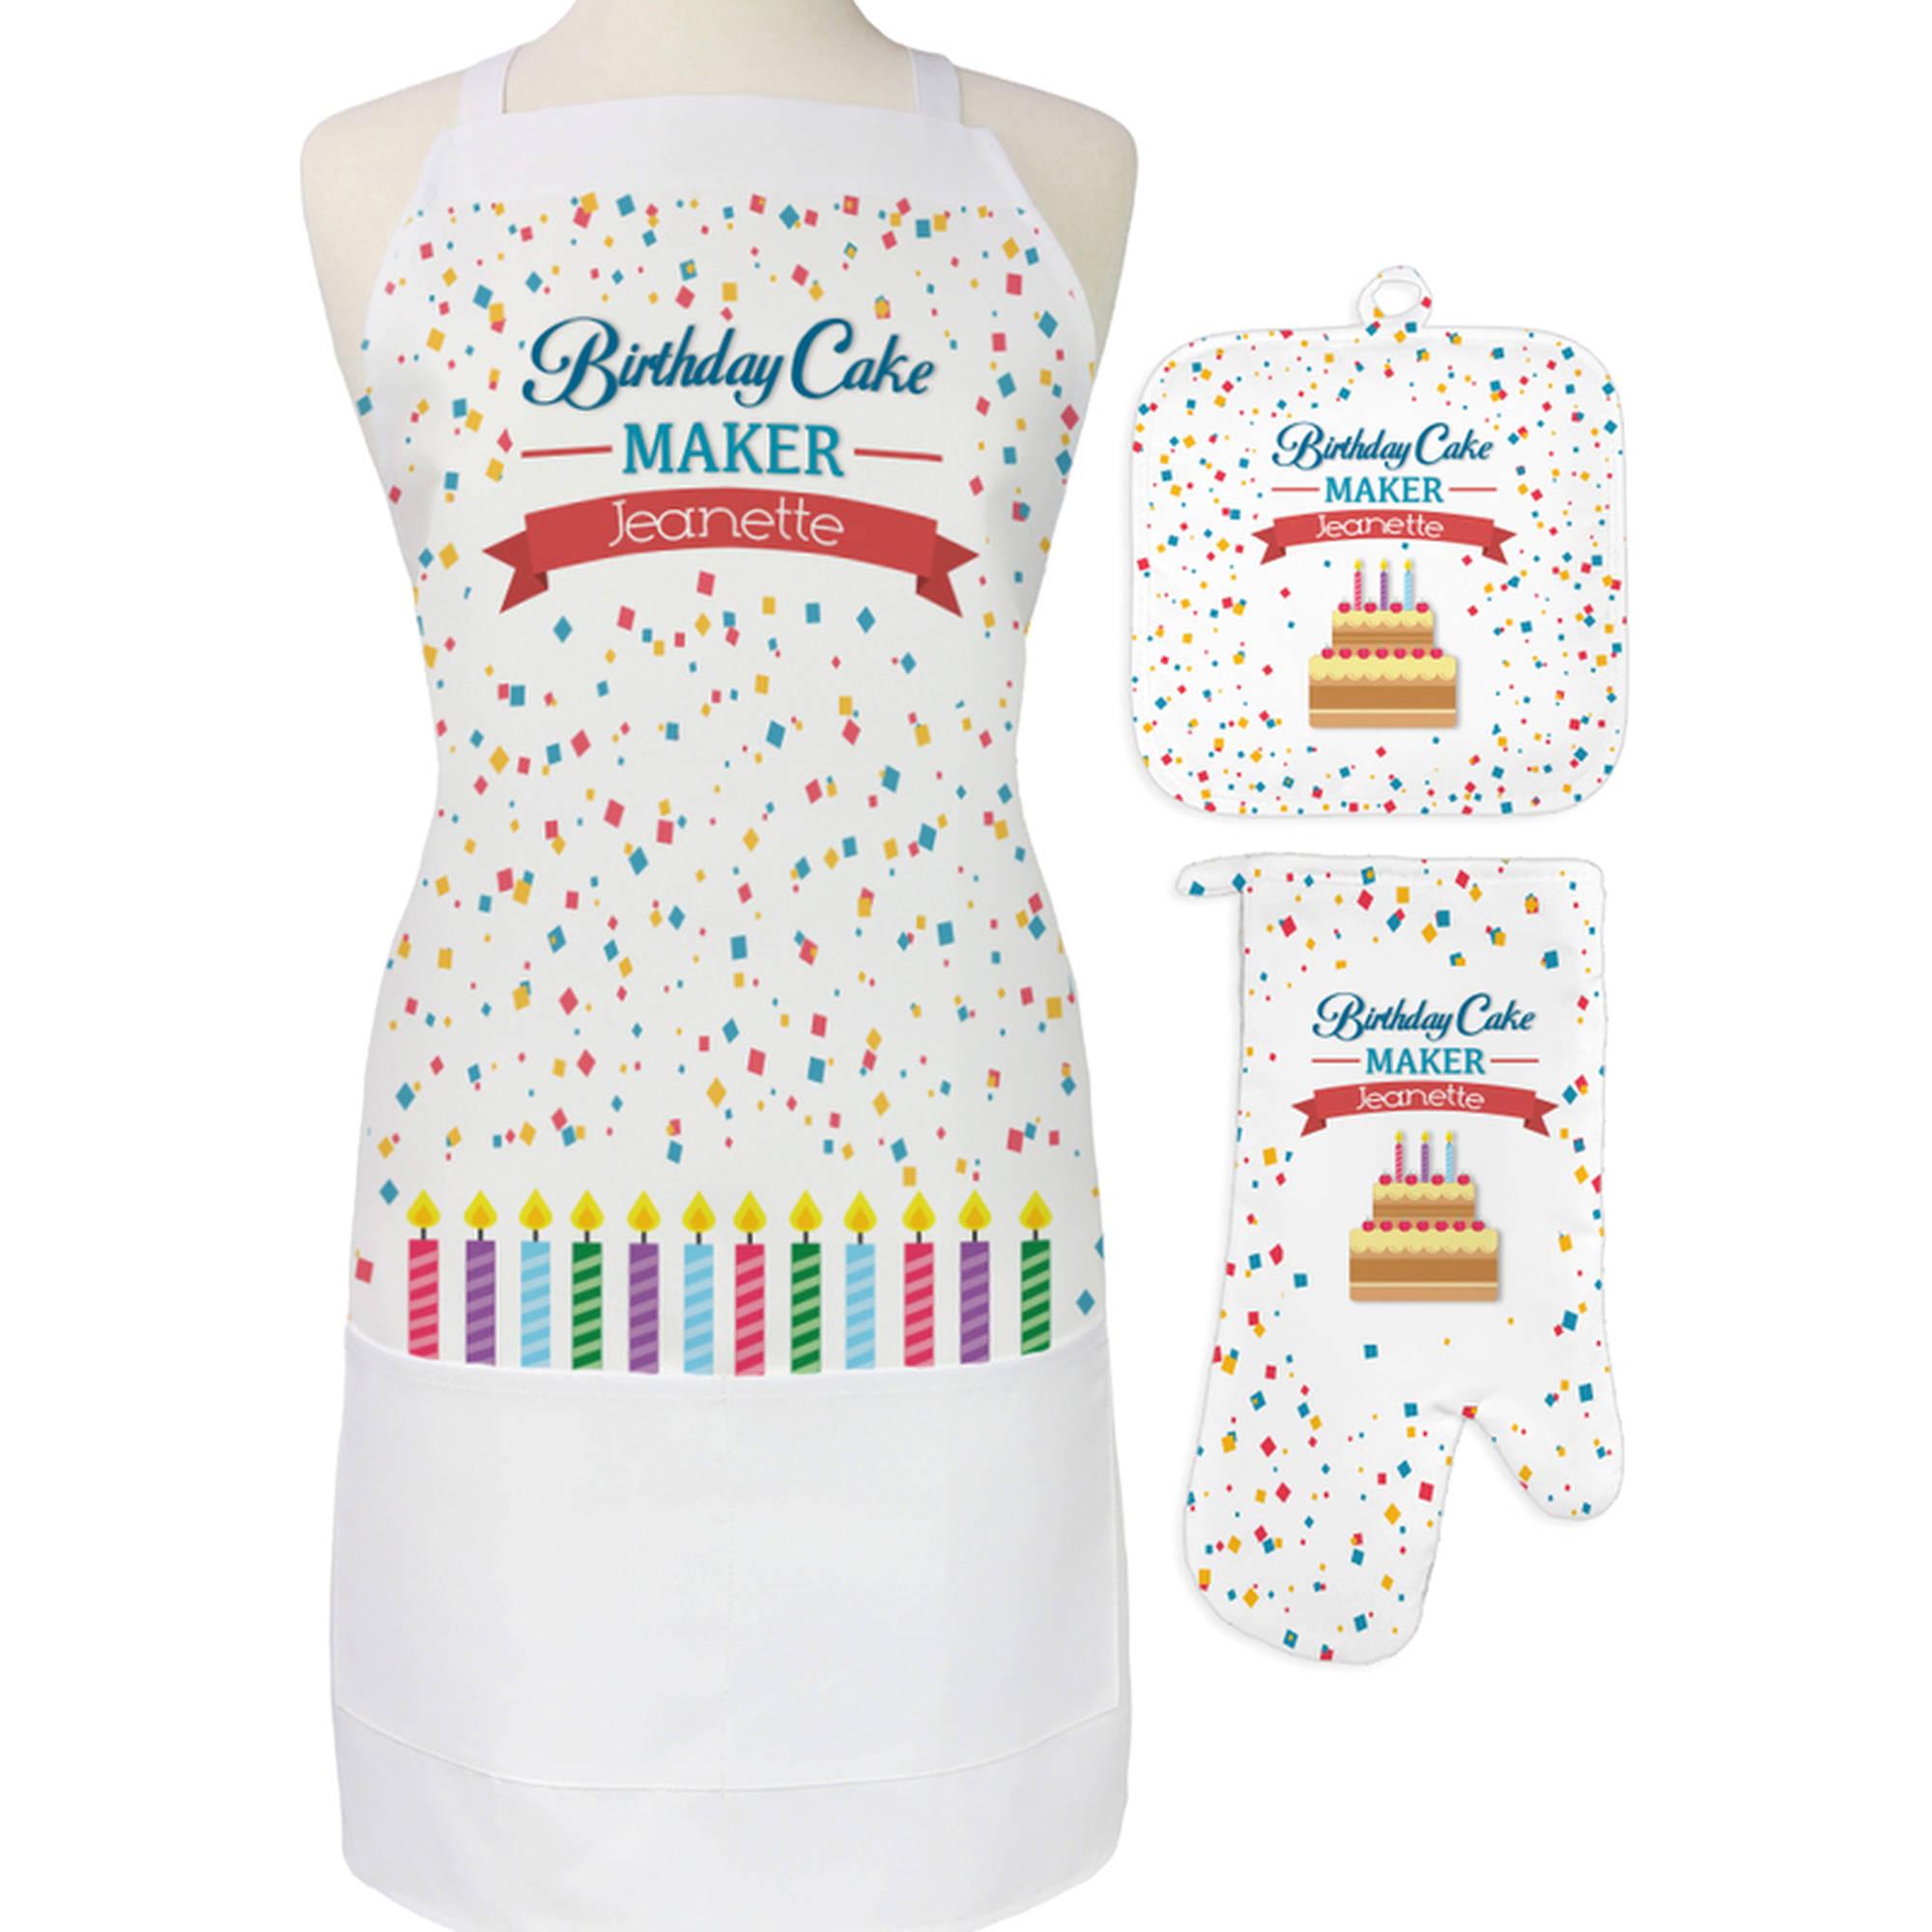 Personalized Birthday Cake Maker 3-Piece Apron, Potholder and Oven Mitt Set